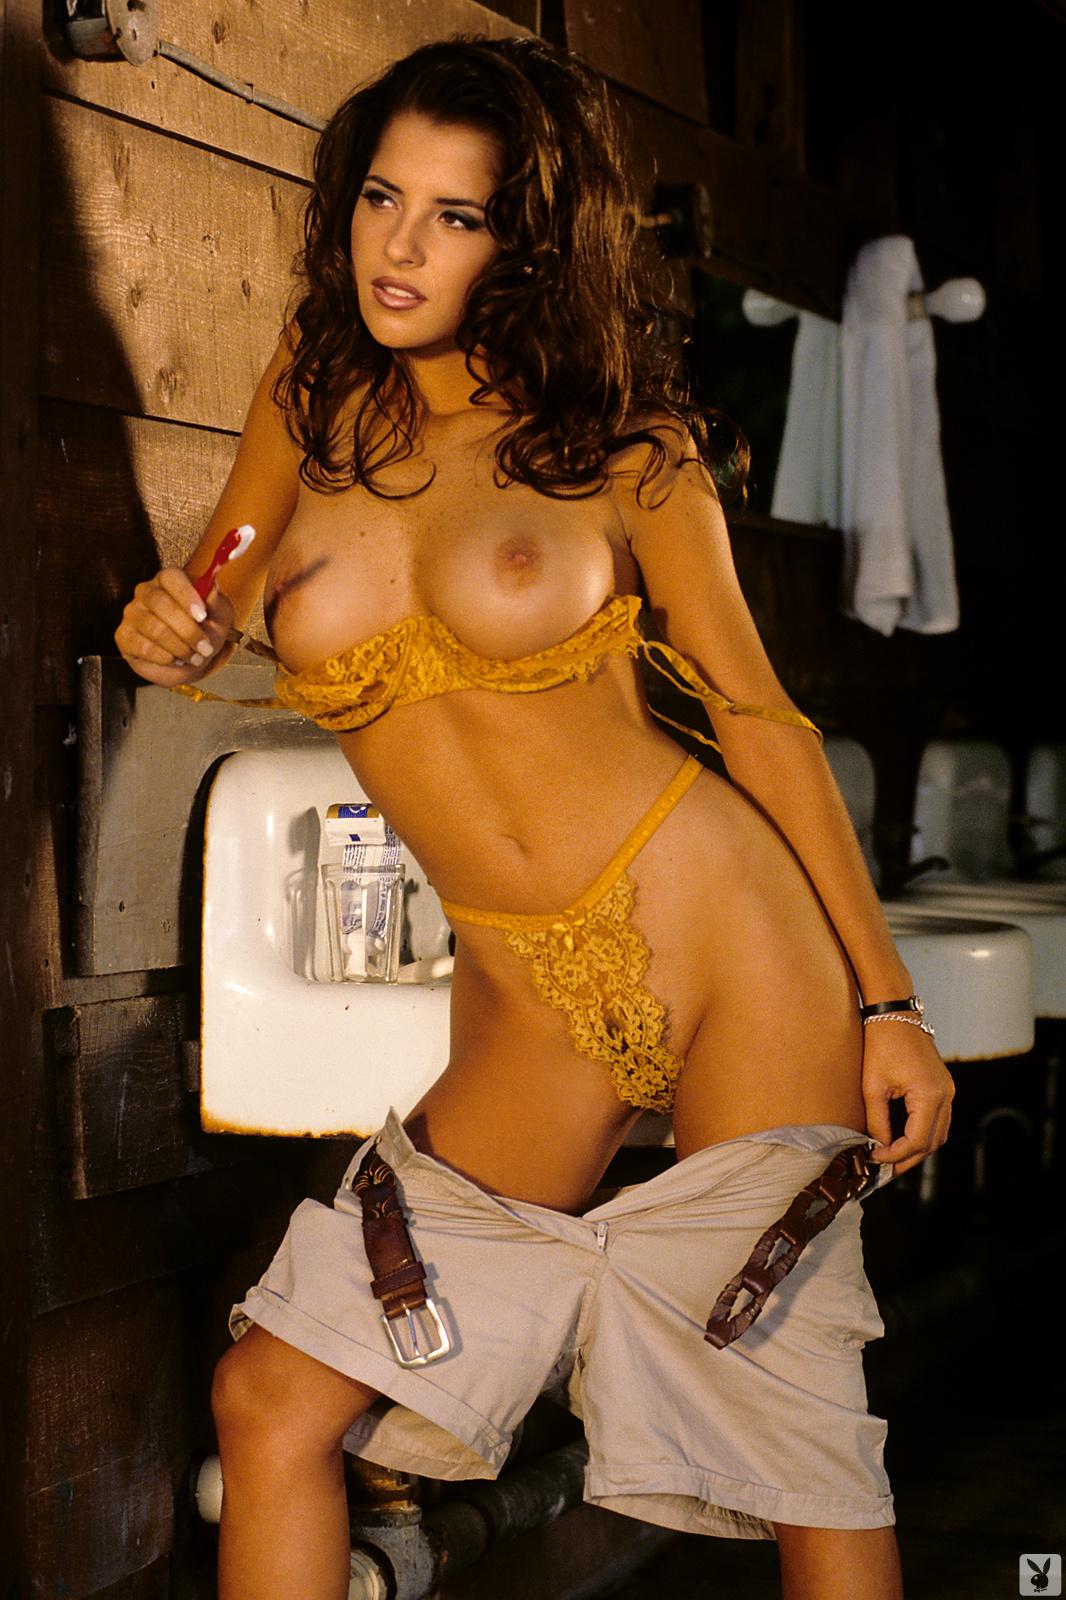 kelly-monaco-boobs-naked-playmate-april-1997-playboy-22